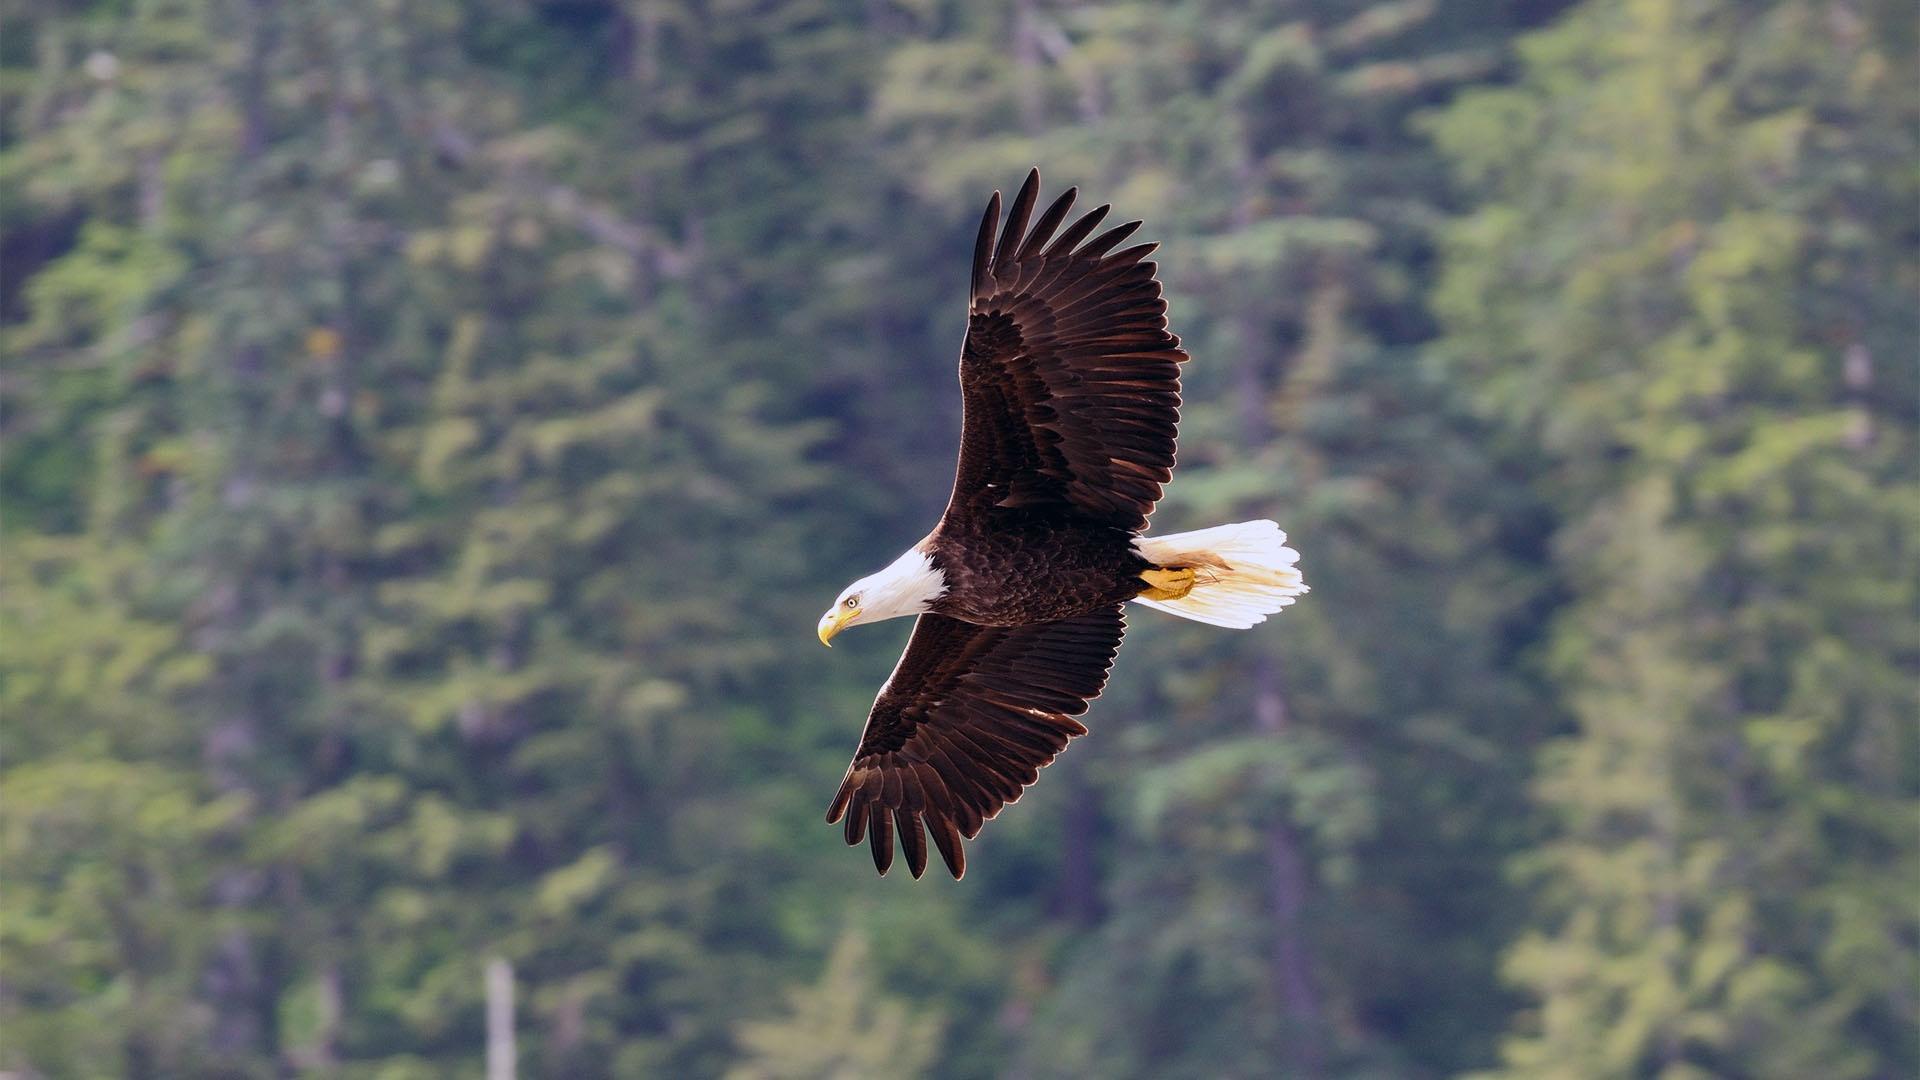 Wild Alaska Live Wild Bald Eagle In Flight Twin Cities Pbs